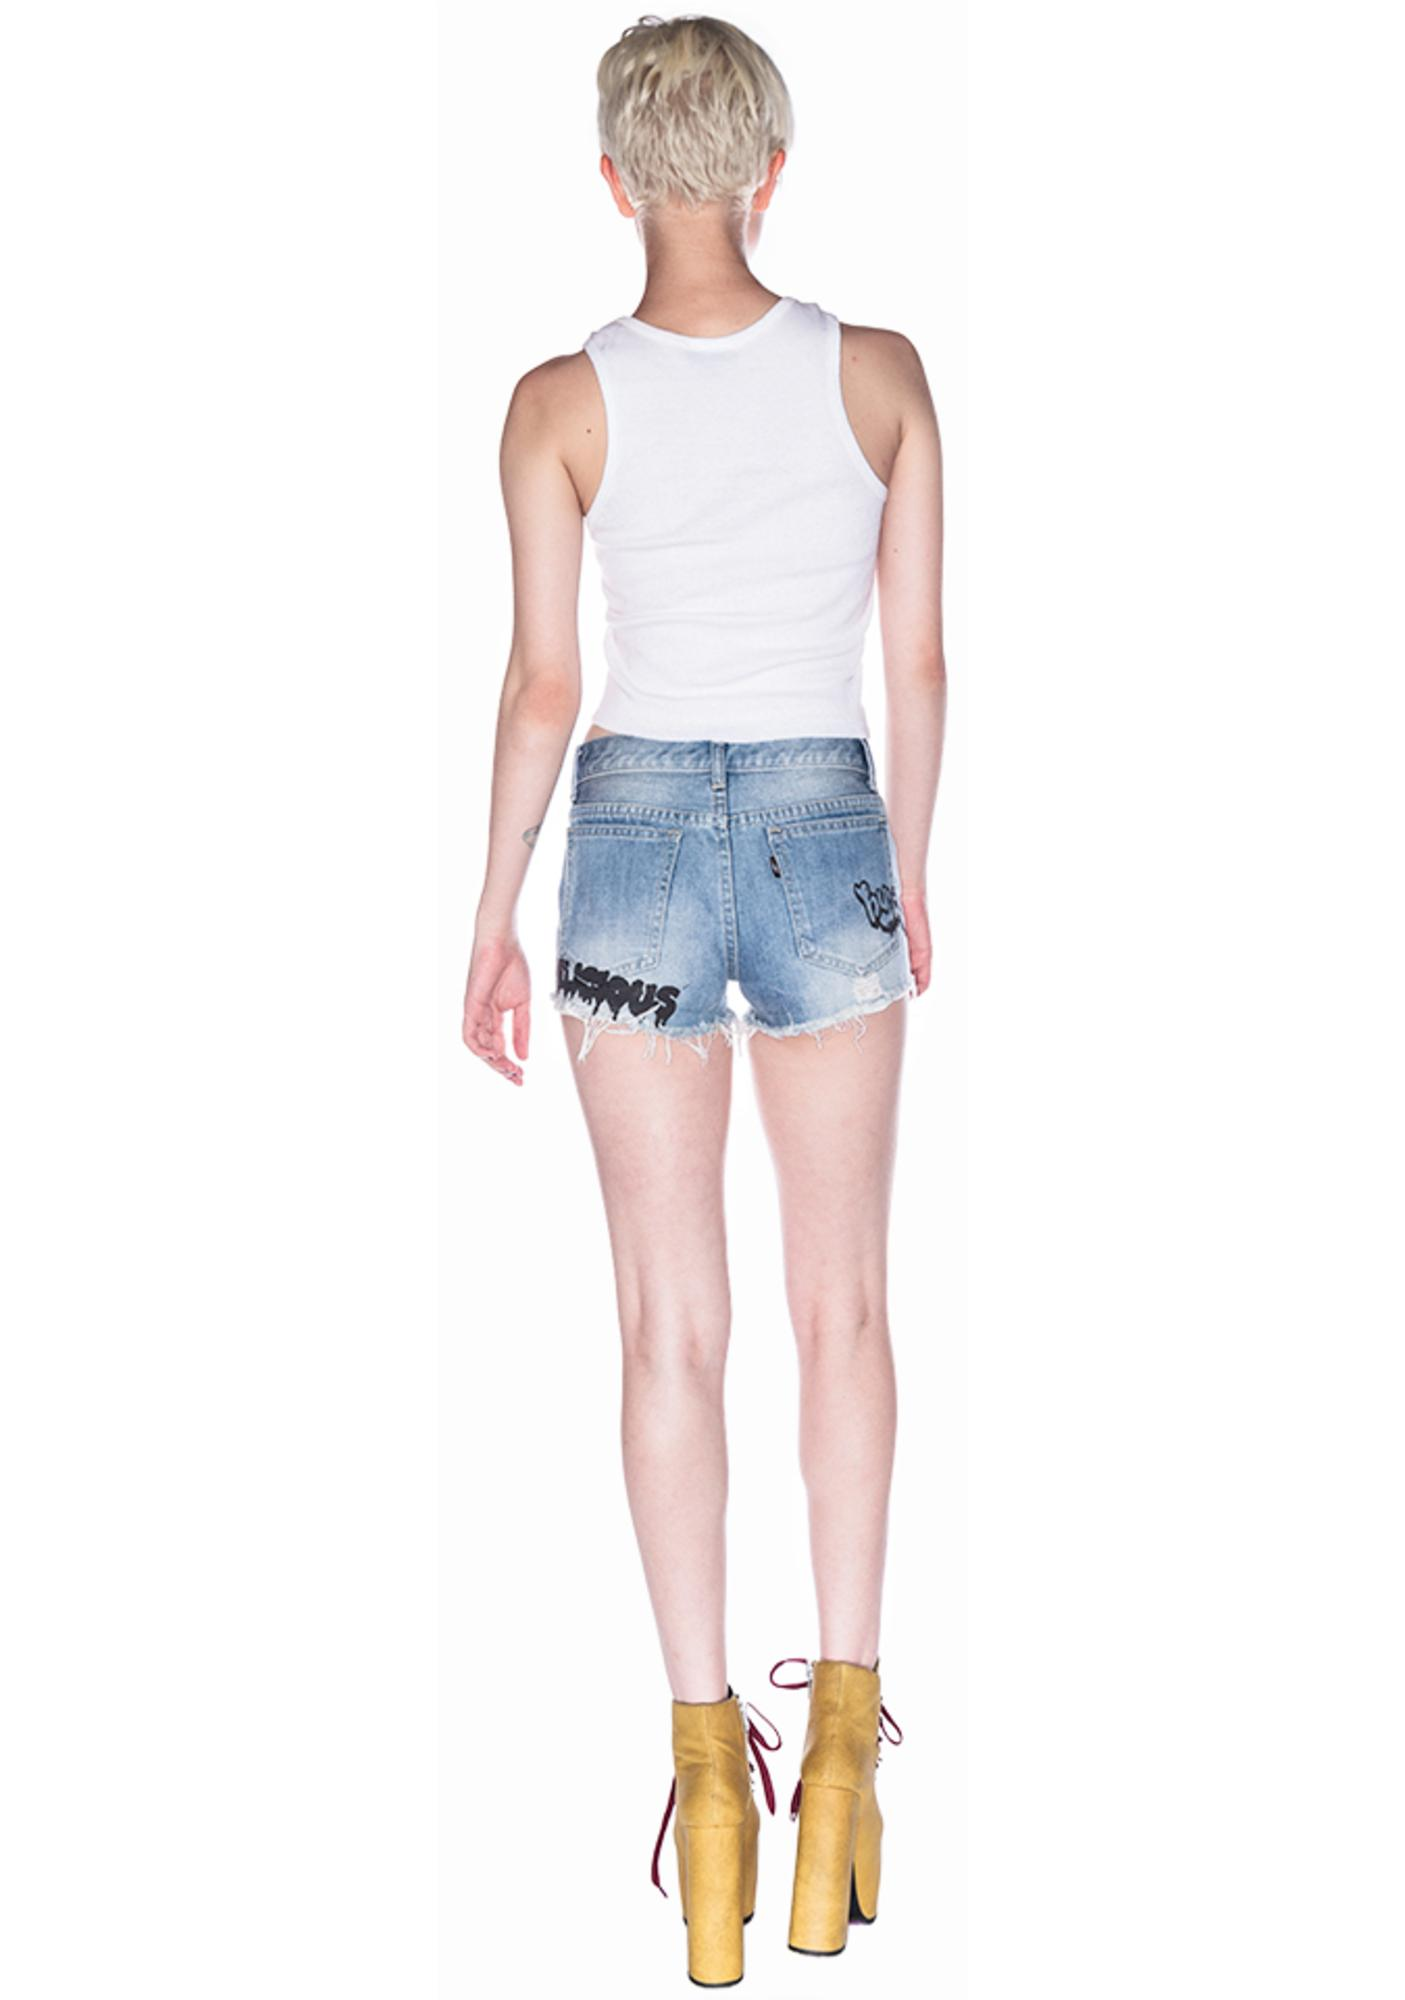 Joyrich Broadway Alley Shorts